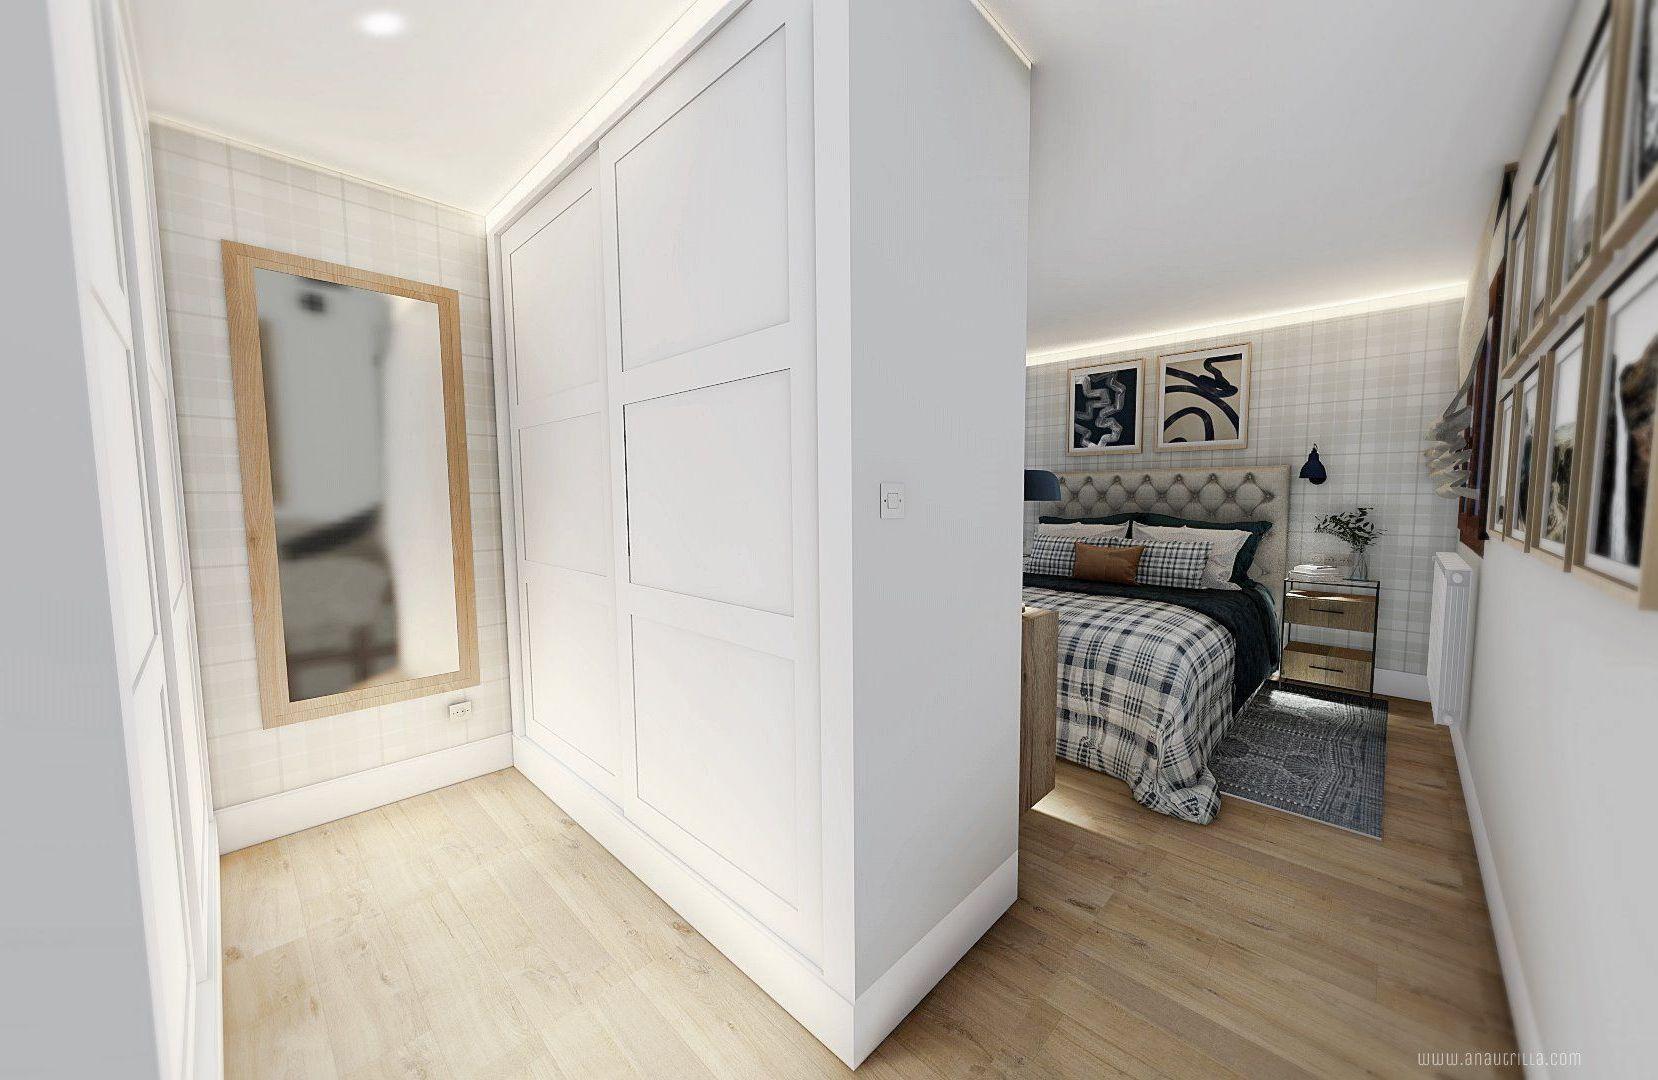 Zona de vestidor de habitación principal de tonos neutros y azules, iluminación indirecta en foseado, armarios empotrados de molduras clásicas modernas en blanco. Proyecto de diseño de interiores 3D online en Valladolid, España #Anautrillainteriorismo @utrillanais